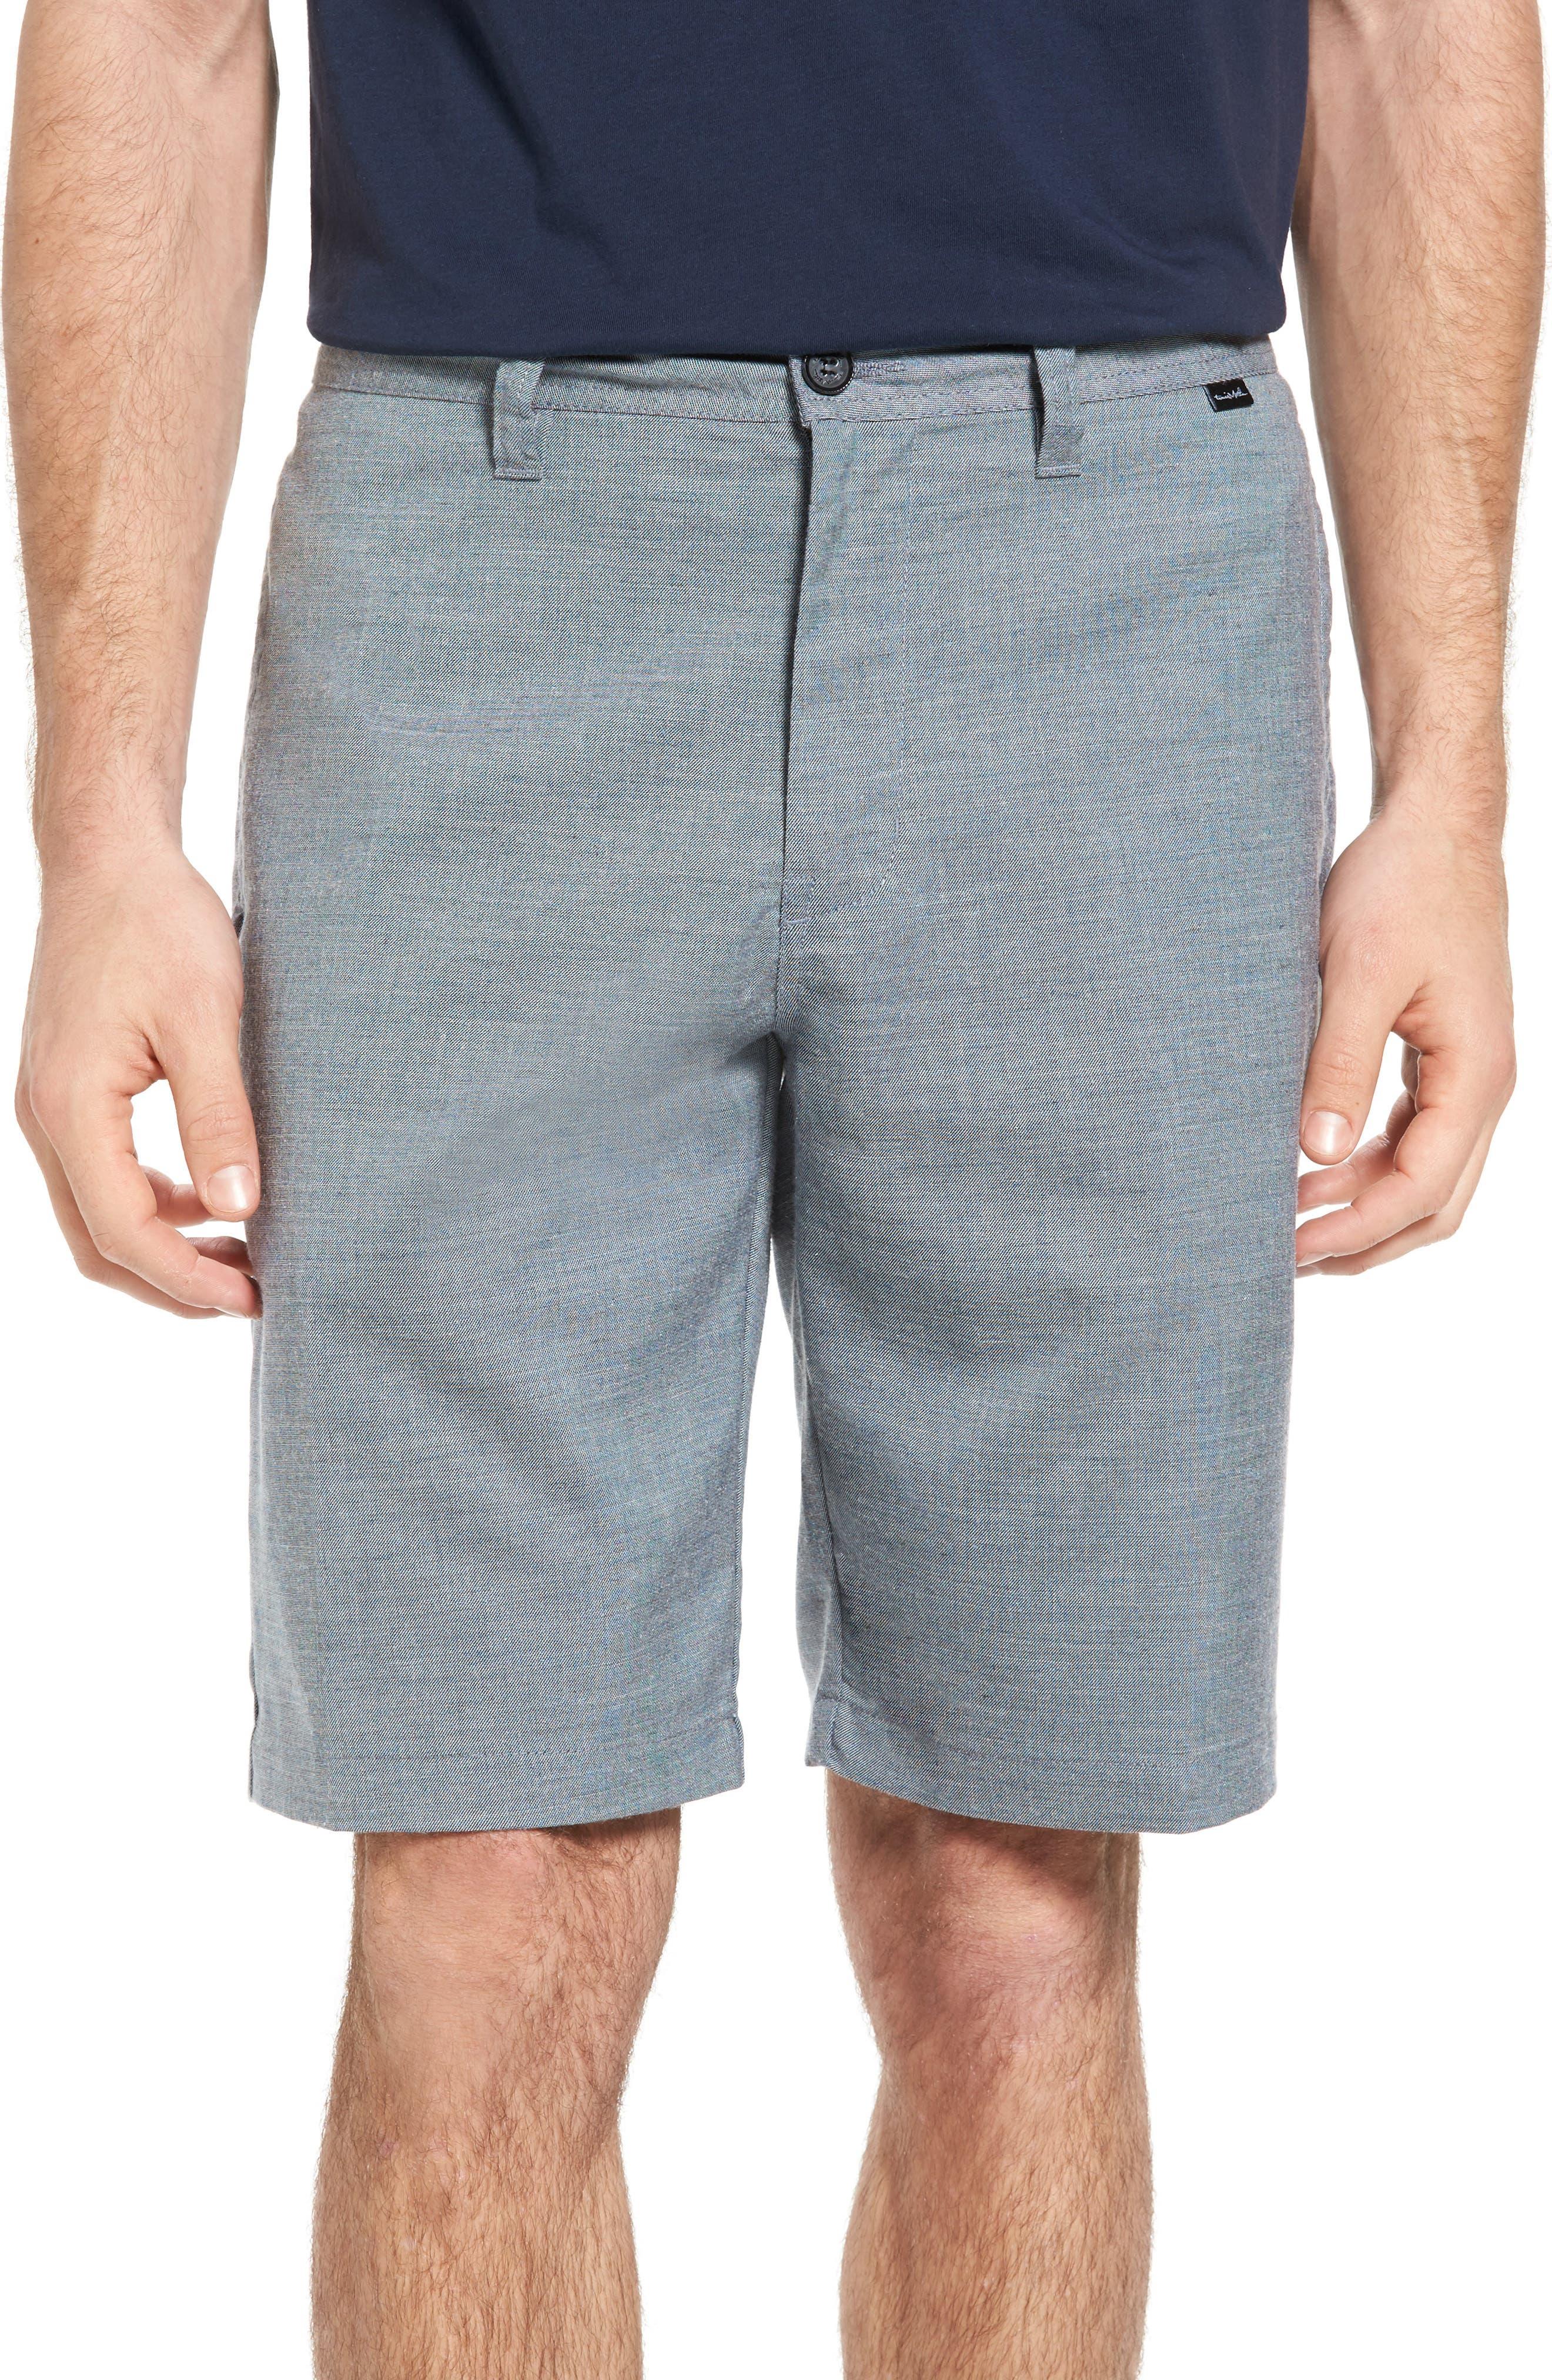 Romers Stretch Shorts,                             Main thumbnail 1, color,                             020